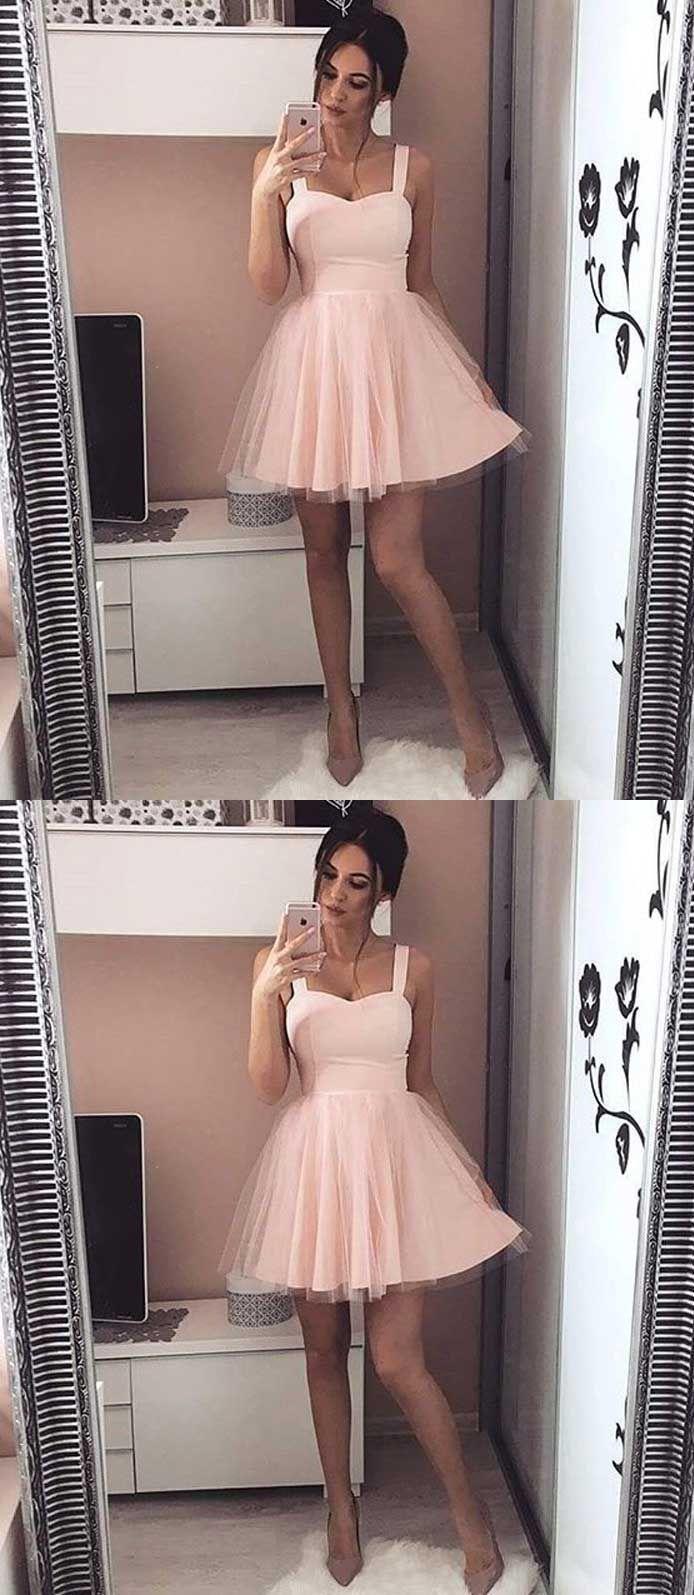 Sweetheart homecoming dress strapslight pink homecoming dresstulle